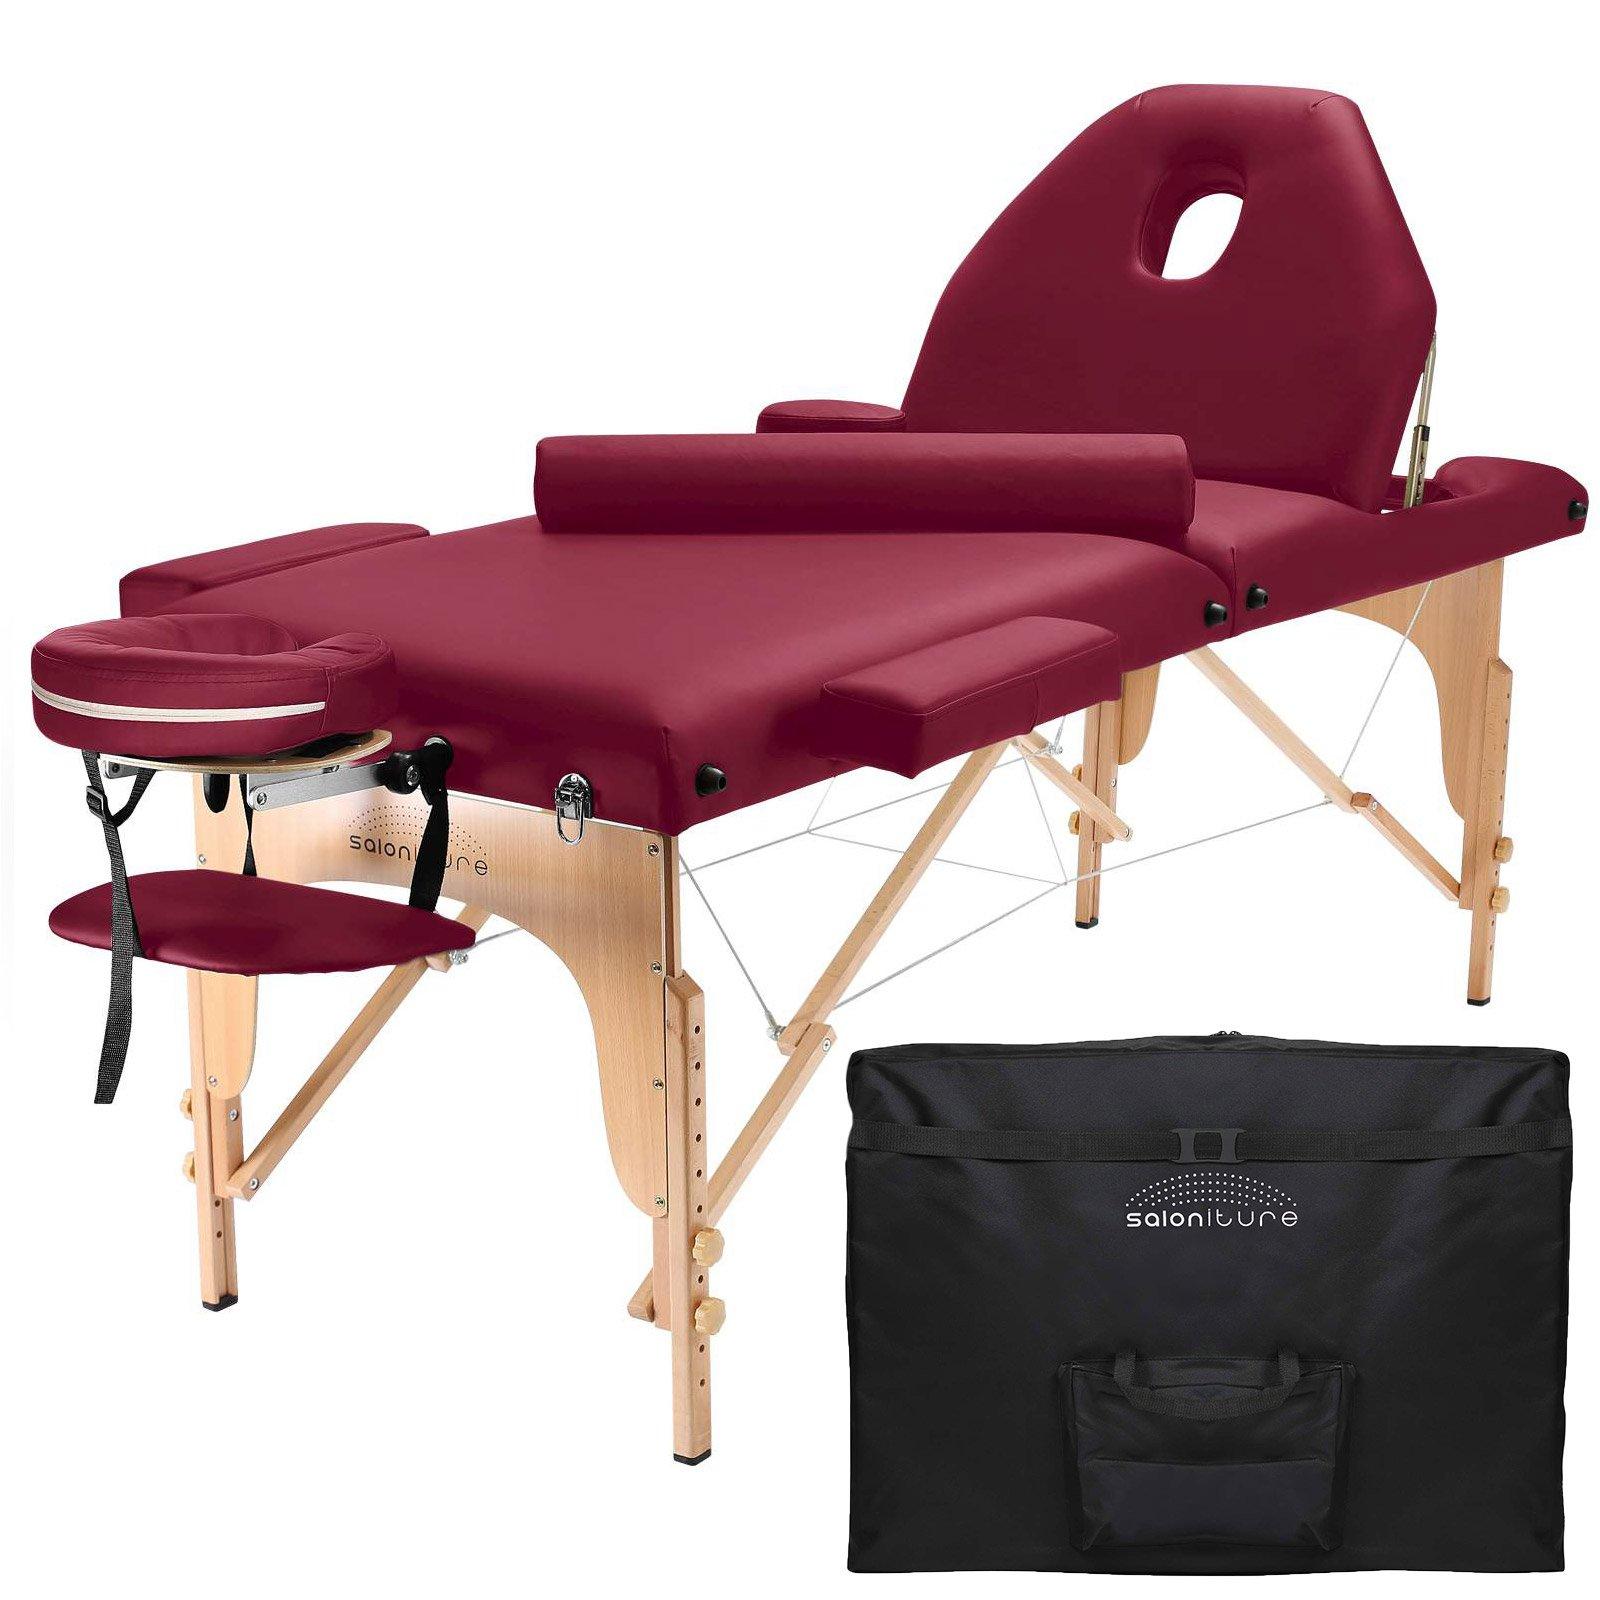 Saloniture Professional Portable Massage Table with Backrest - Burgundy